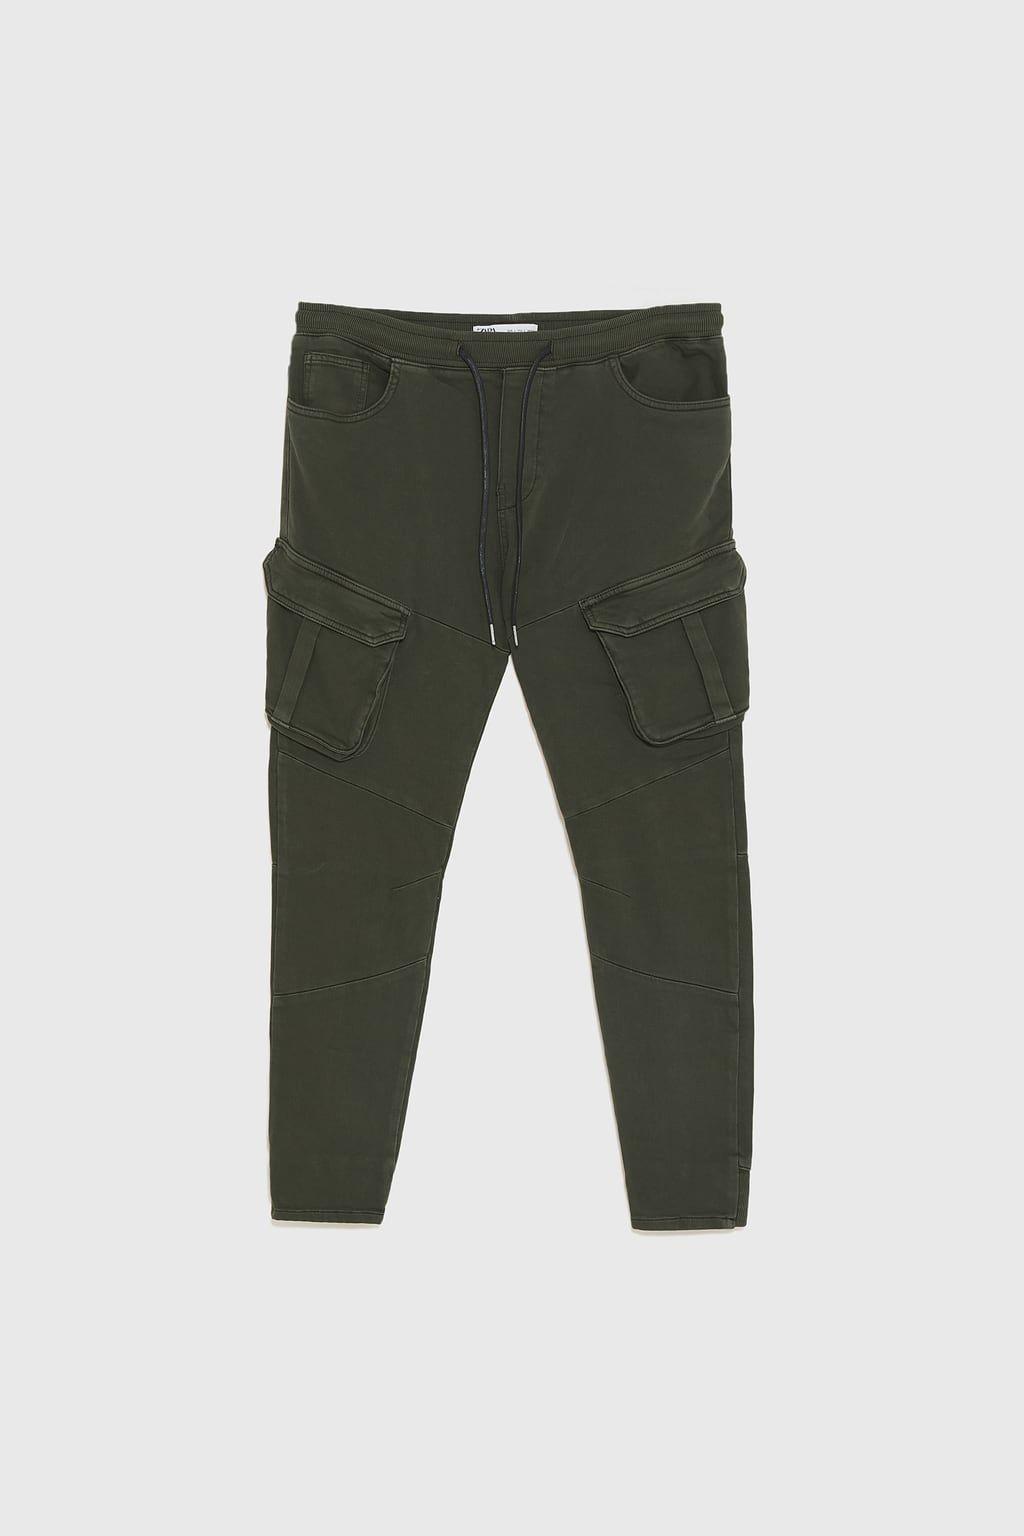 Pantalon Jogger Denim Soft Ver Todo Jeans Hombre Zara Peru Pantalon Jogger Pantalones Jogging